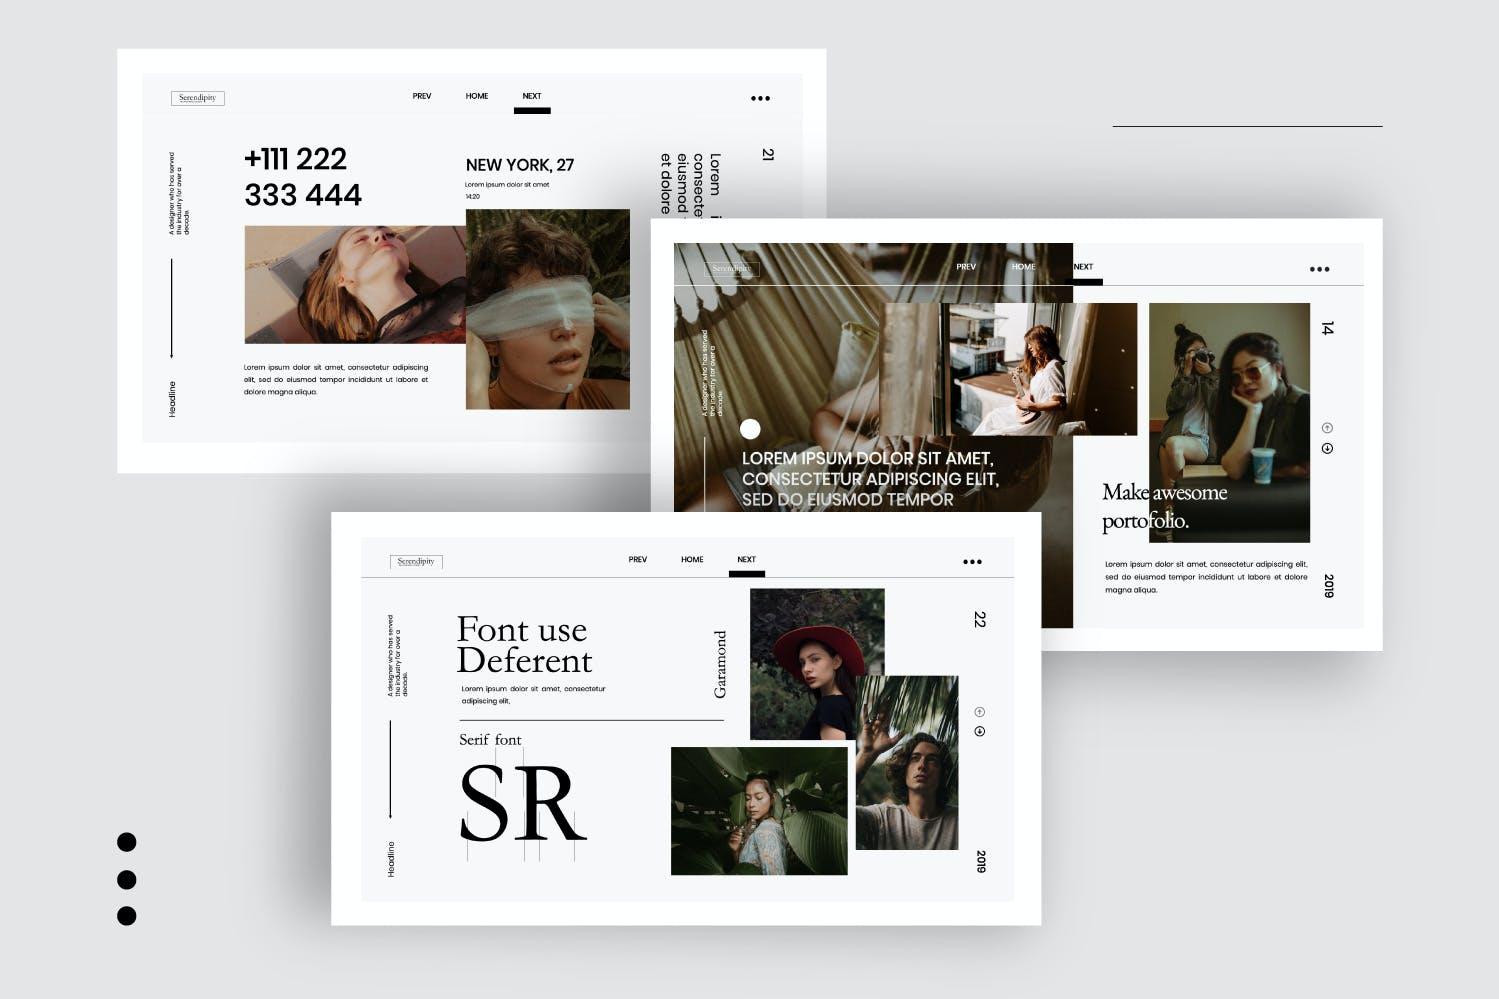 时尚简约服装摄影作品集幻灯片设计模板 Serendipity – Modern Fashion Design Powerpoint插图(1)